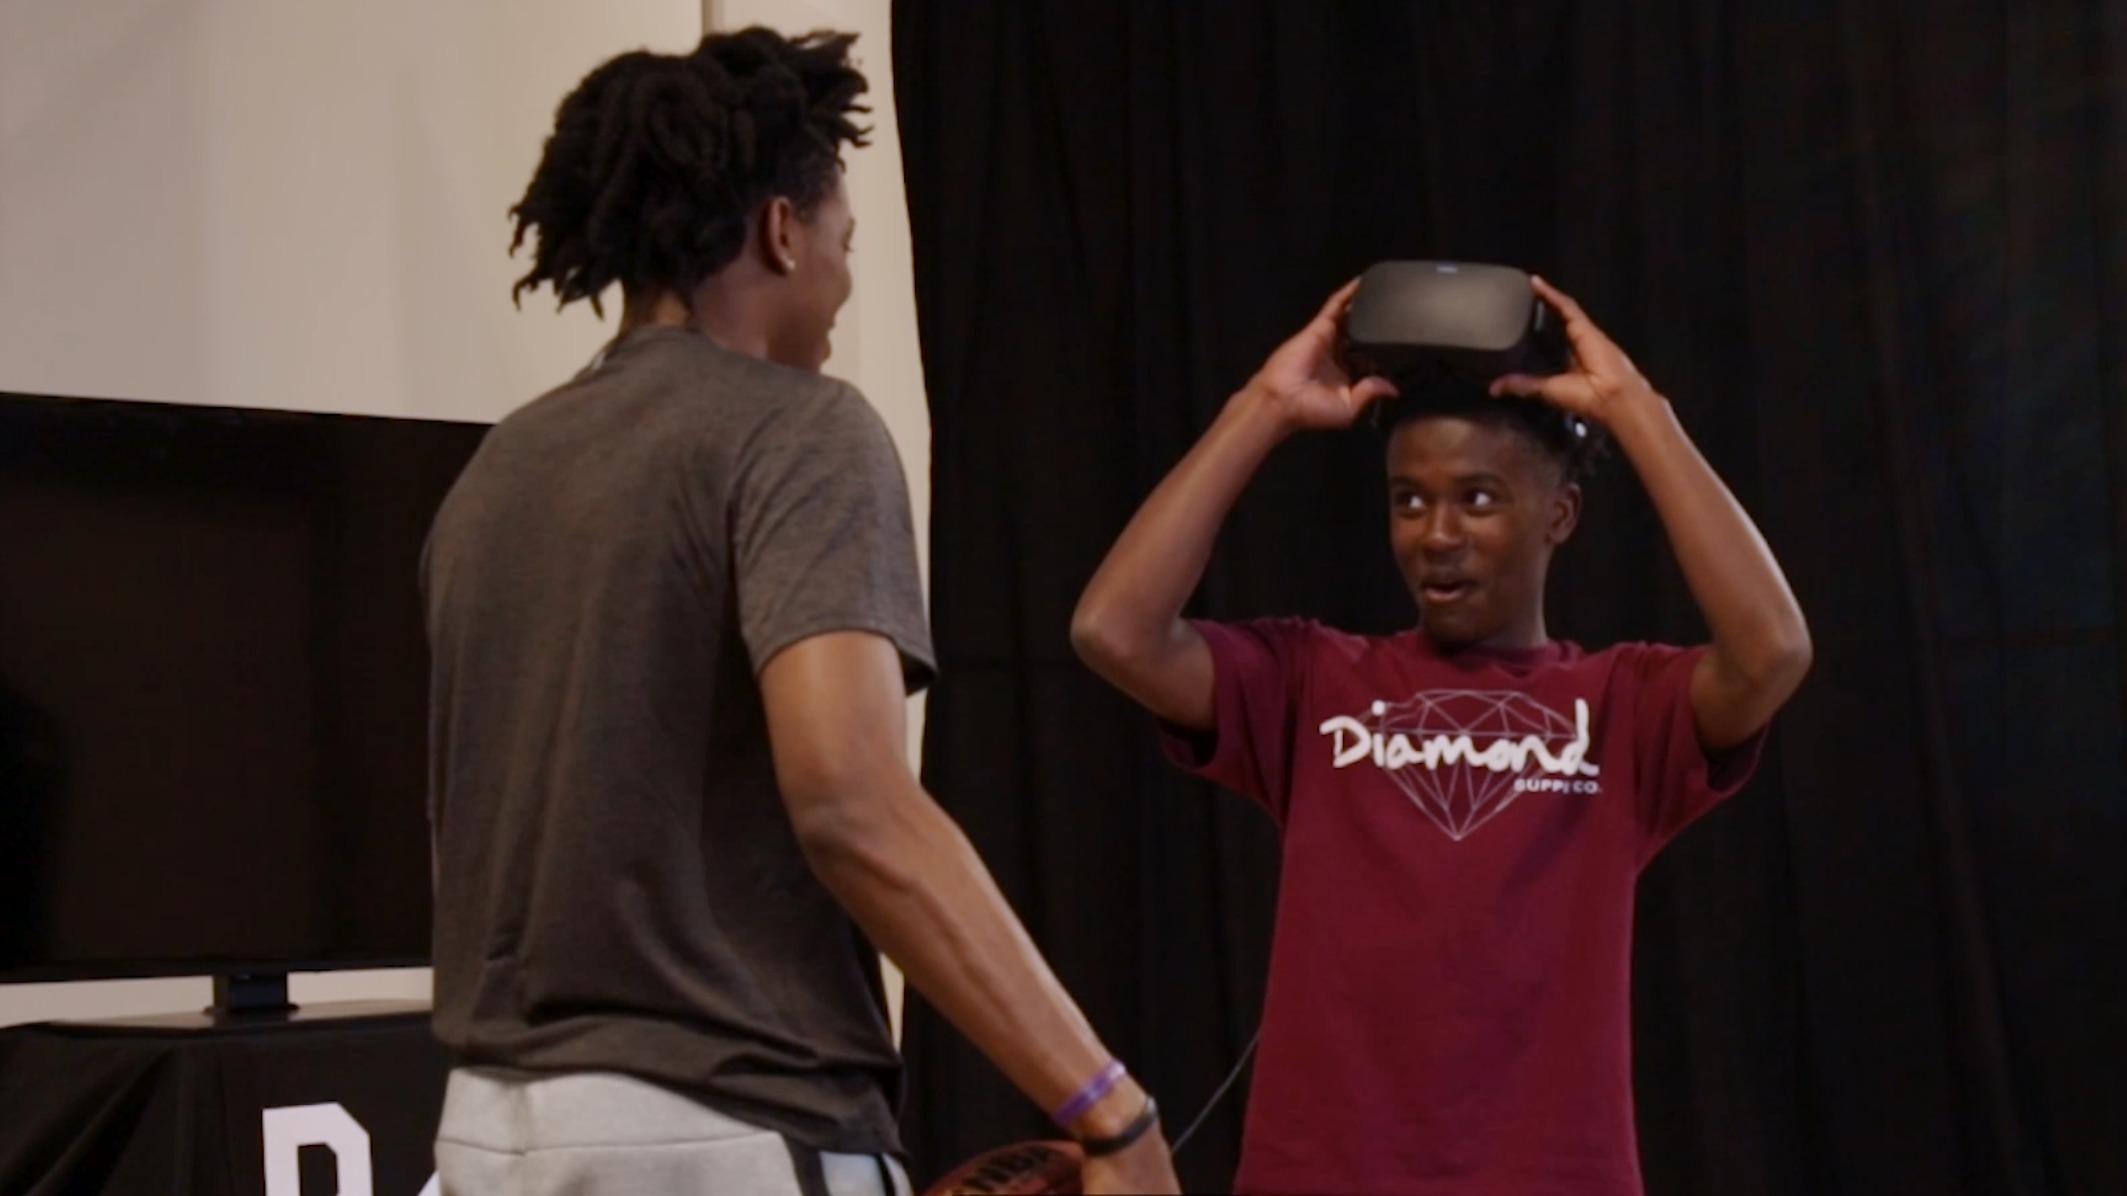 Kings PG De'Aaron Fox Shocks Fans After Virtual Reality Experience